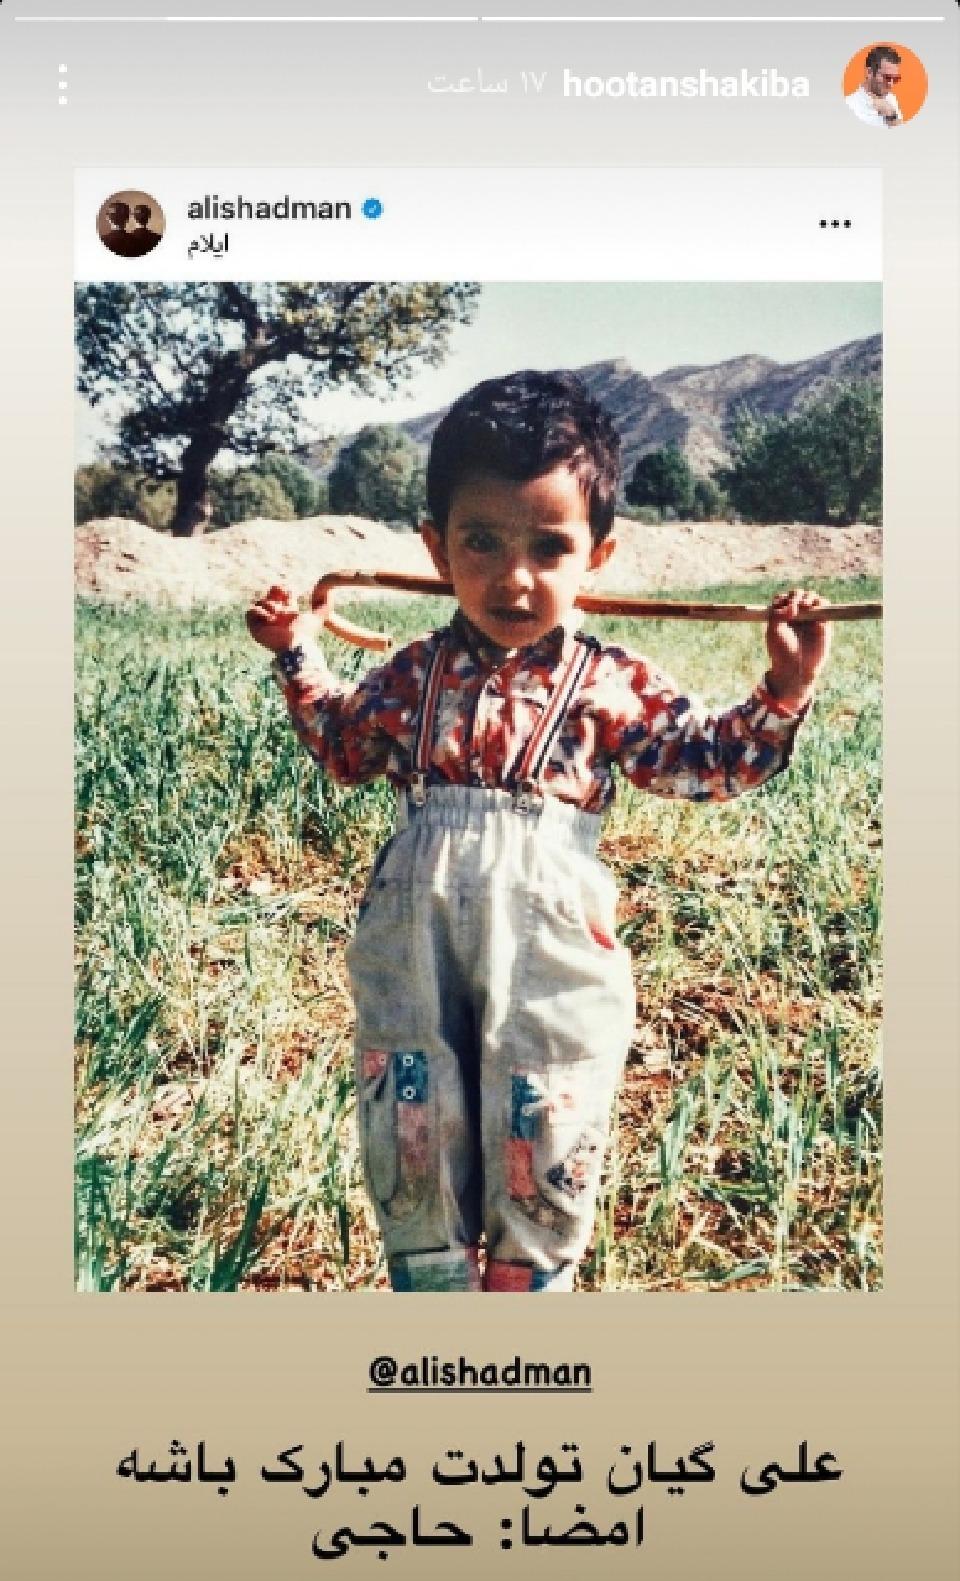 تبریک تولد علی شادمان